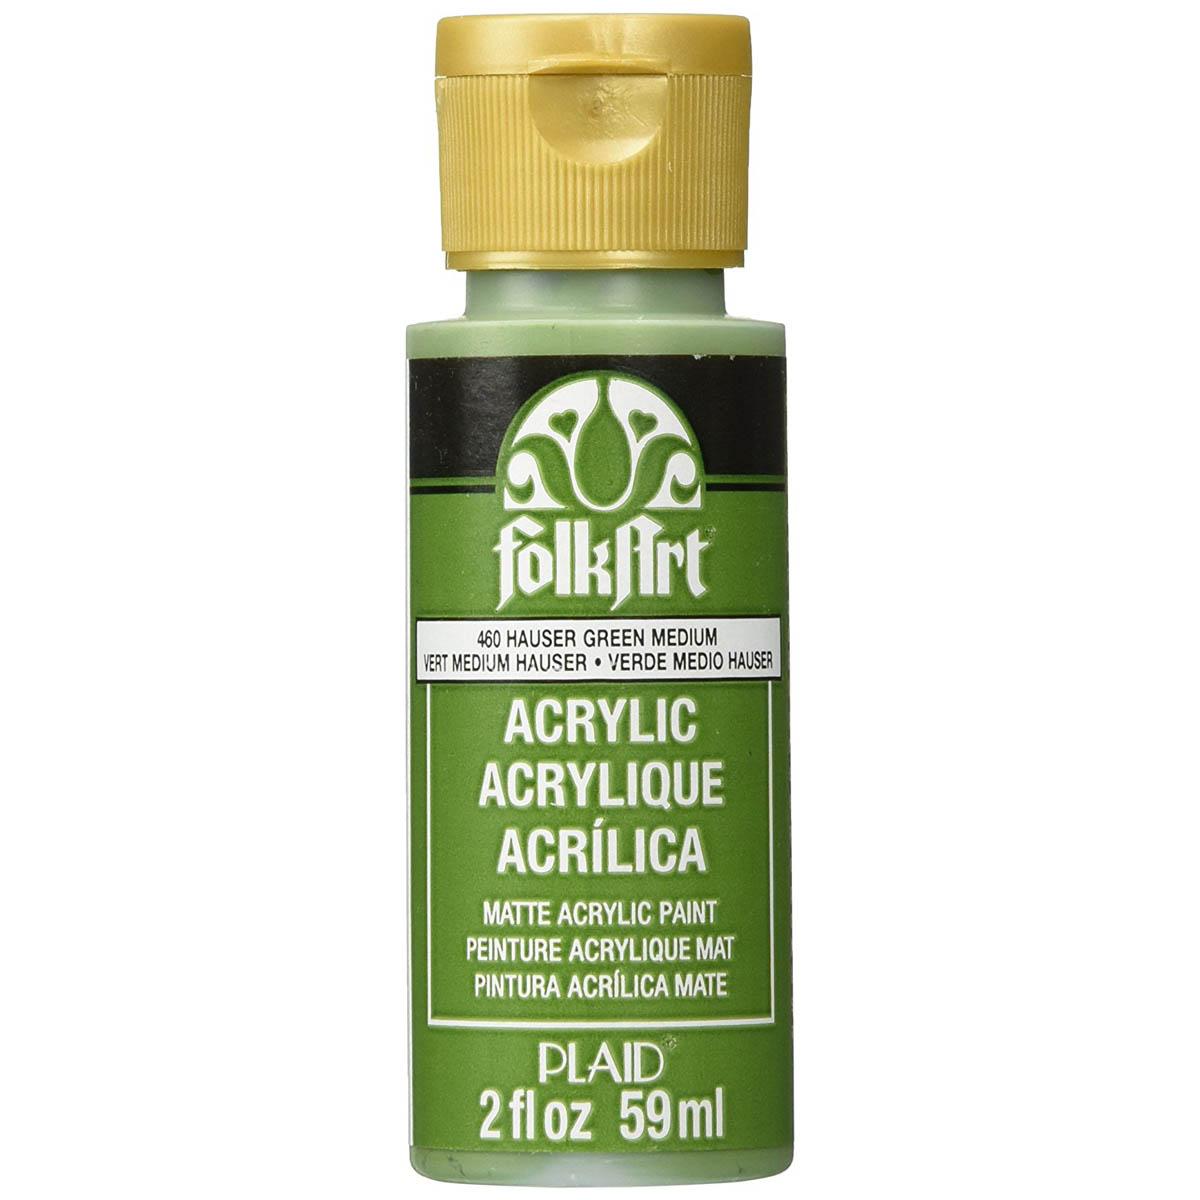 FolkArt ® Acrylic Colors - Hauser Medium Green, 2 oz. - 460